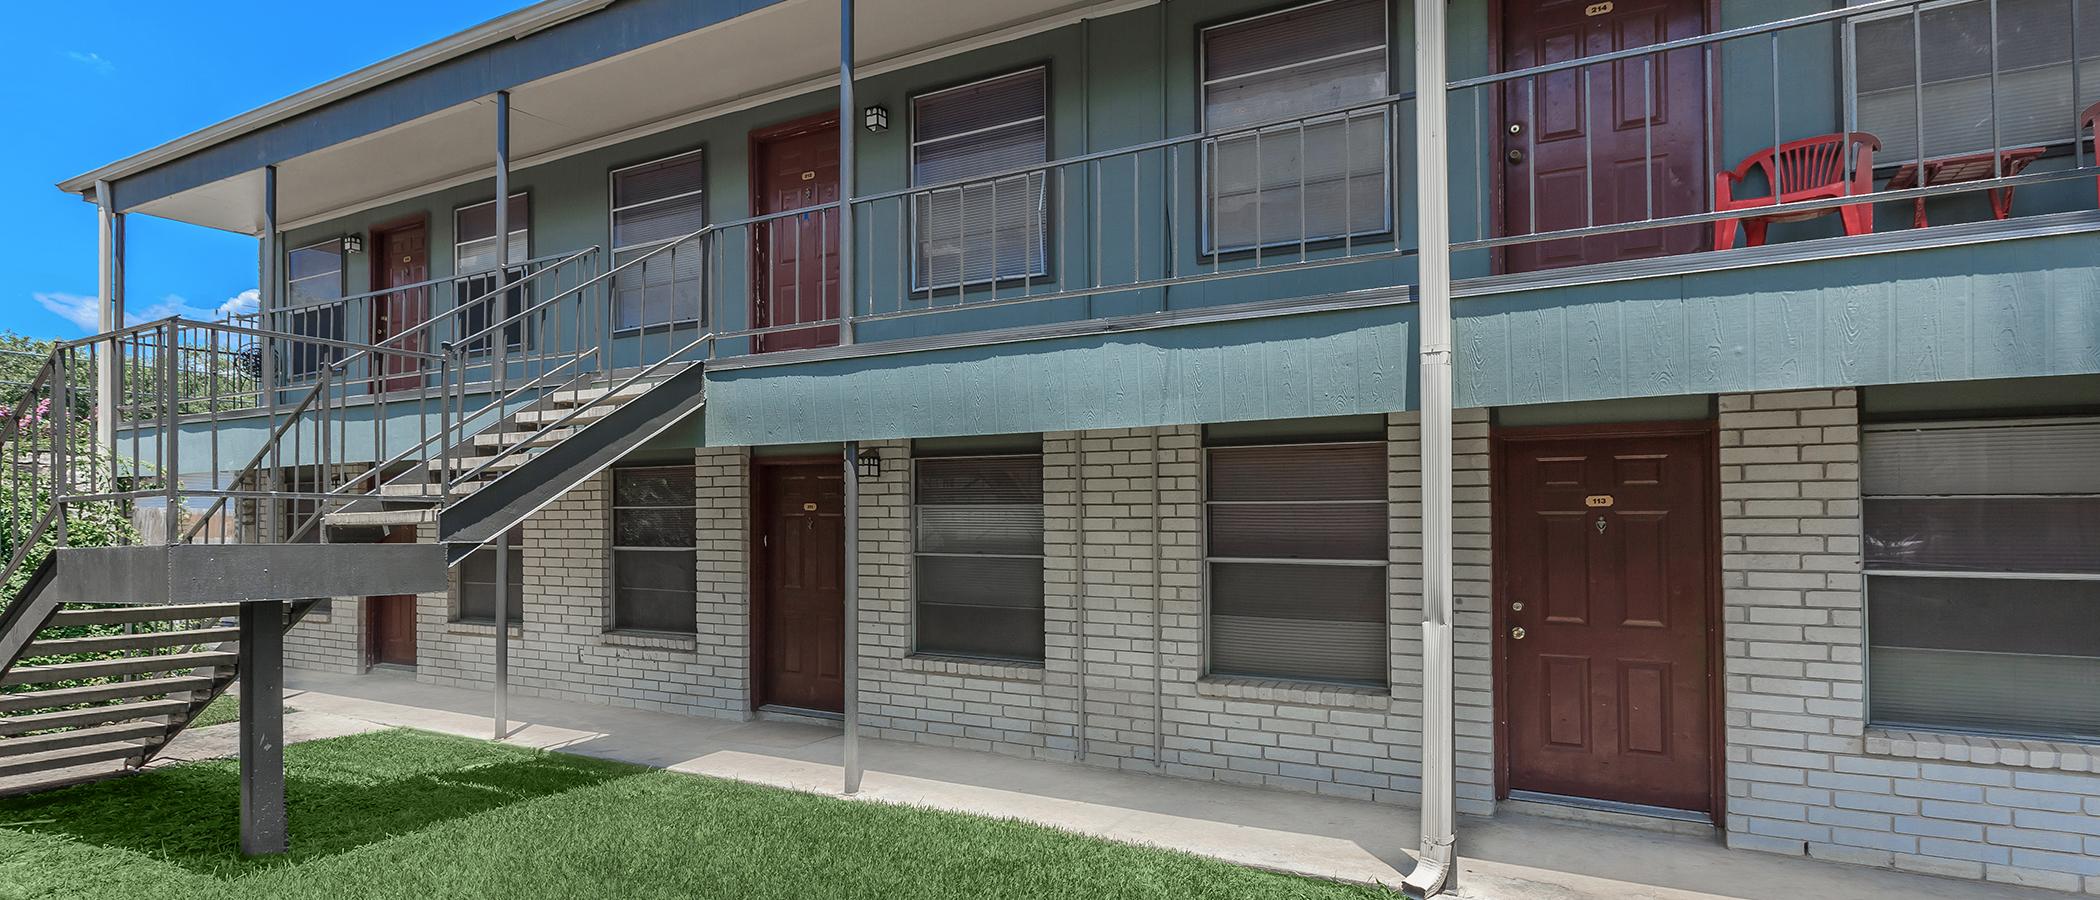 4 Bedroom Apartments In San Antonio 28 Images 4